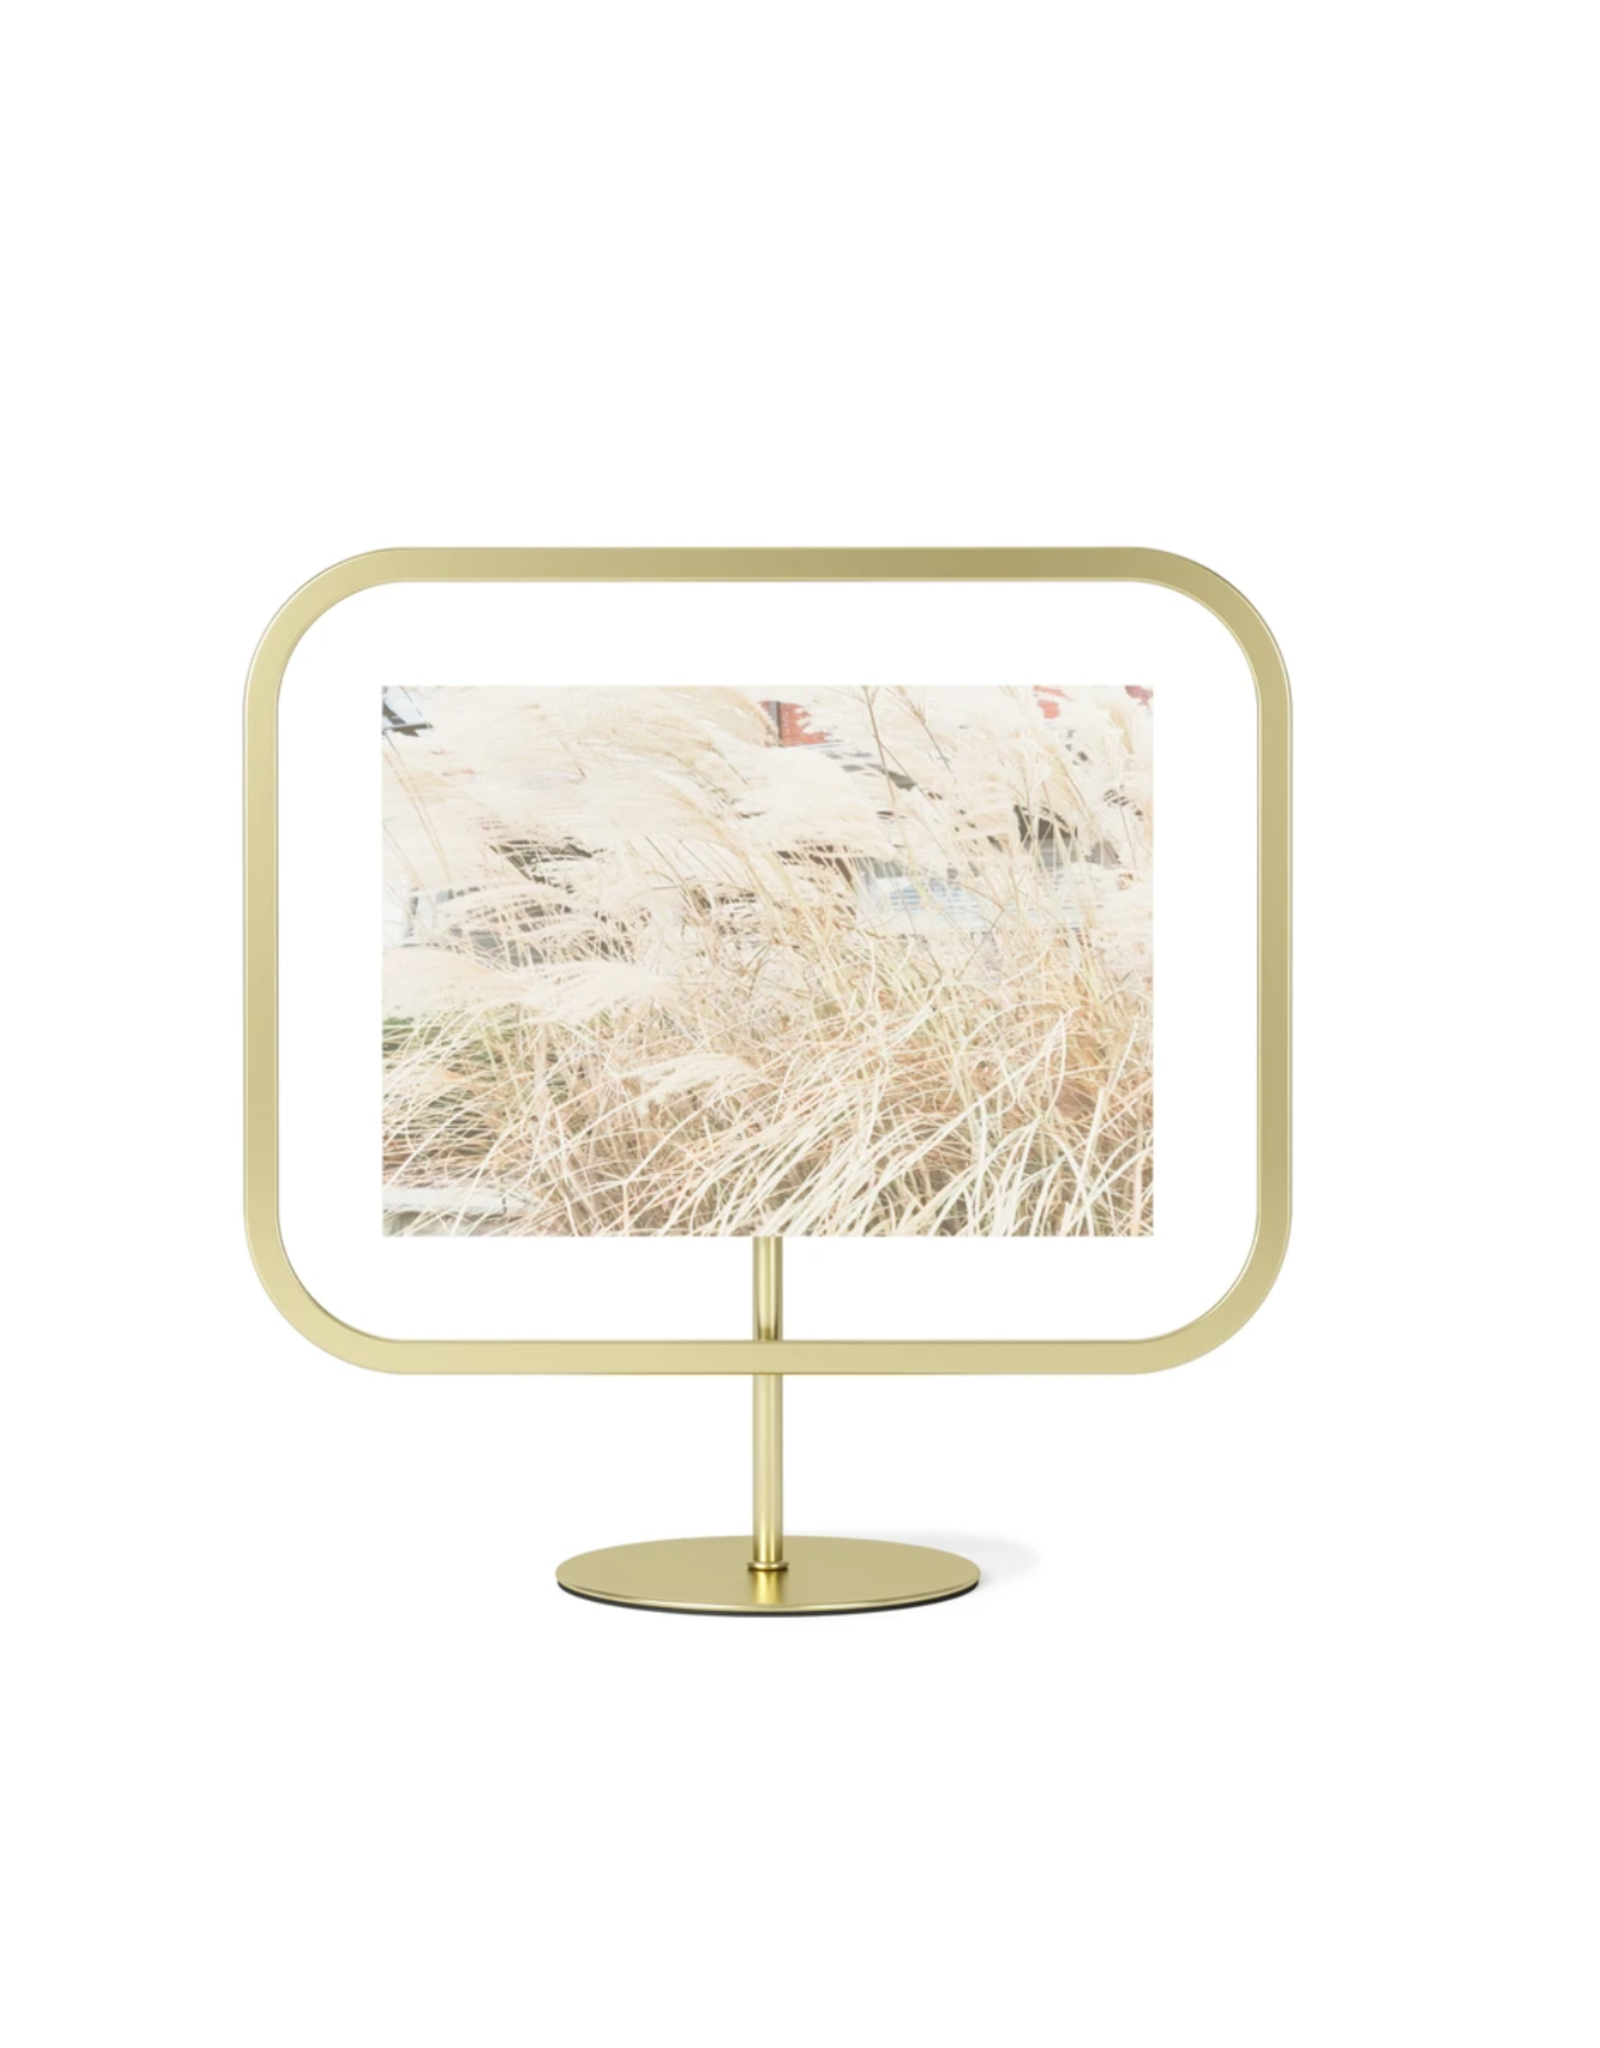 UMBRA Infinity Sqround 5x7 Photo Display in Brass